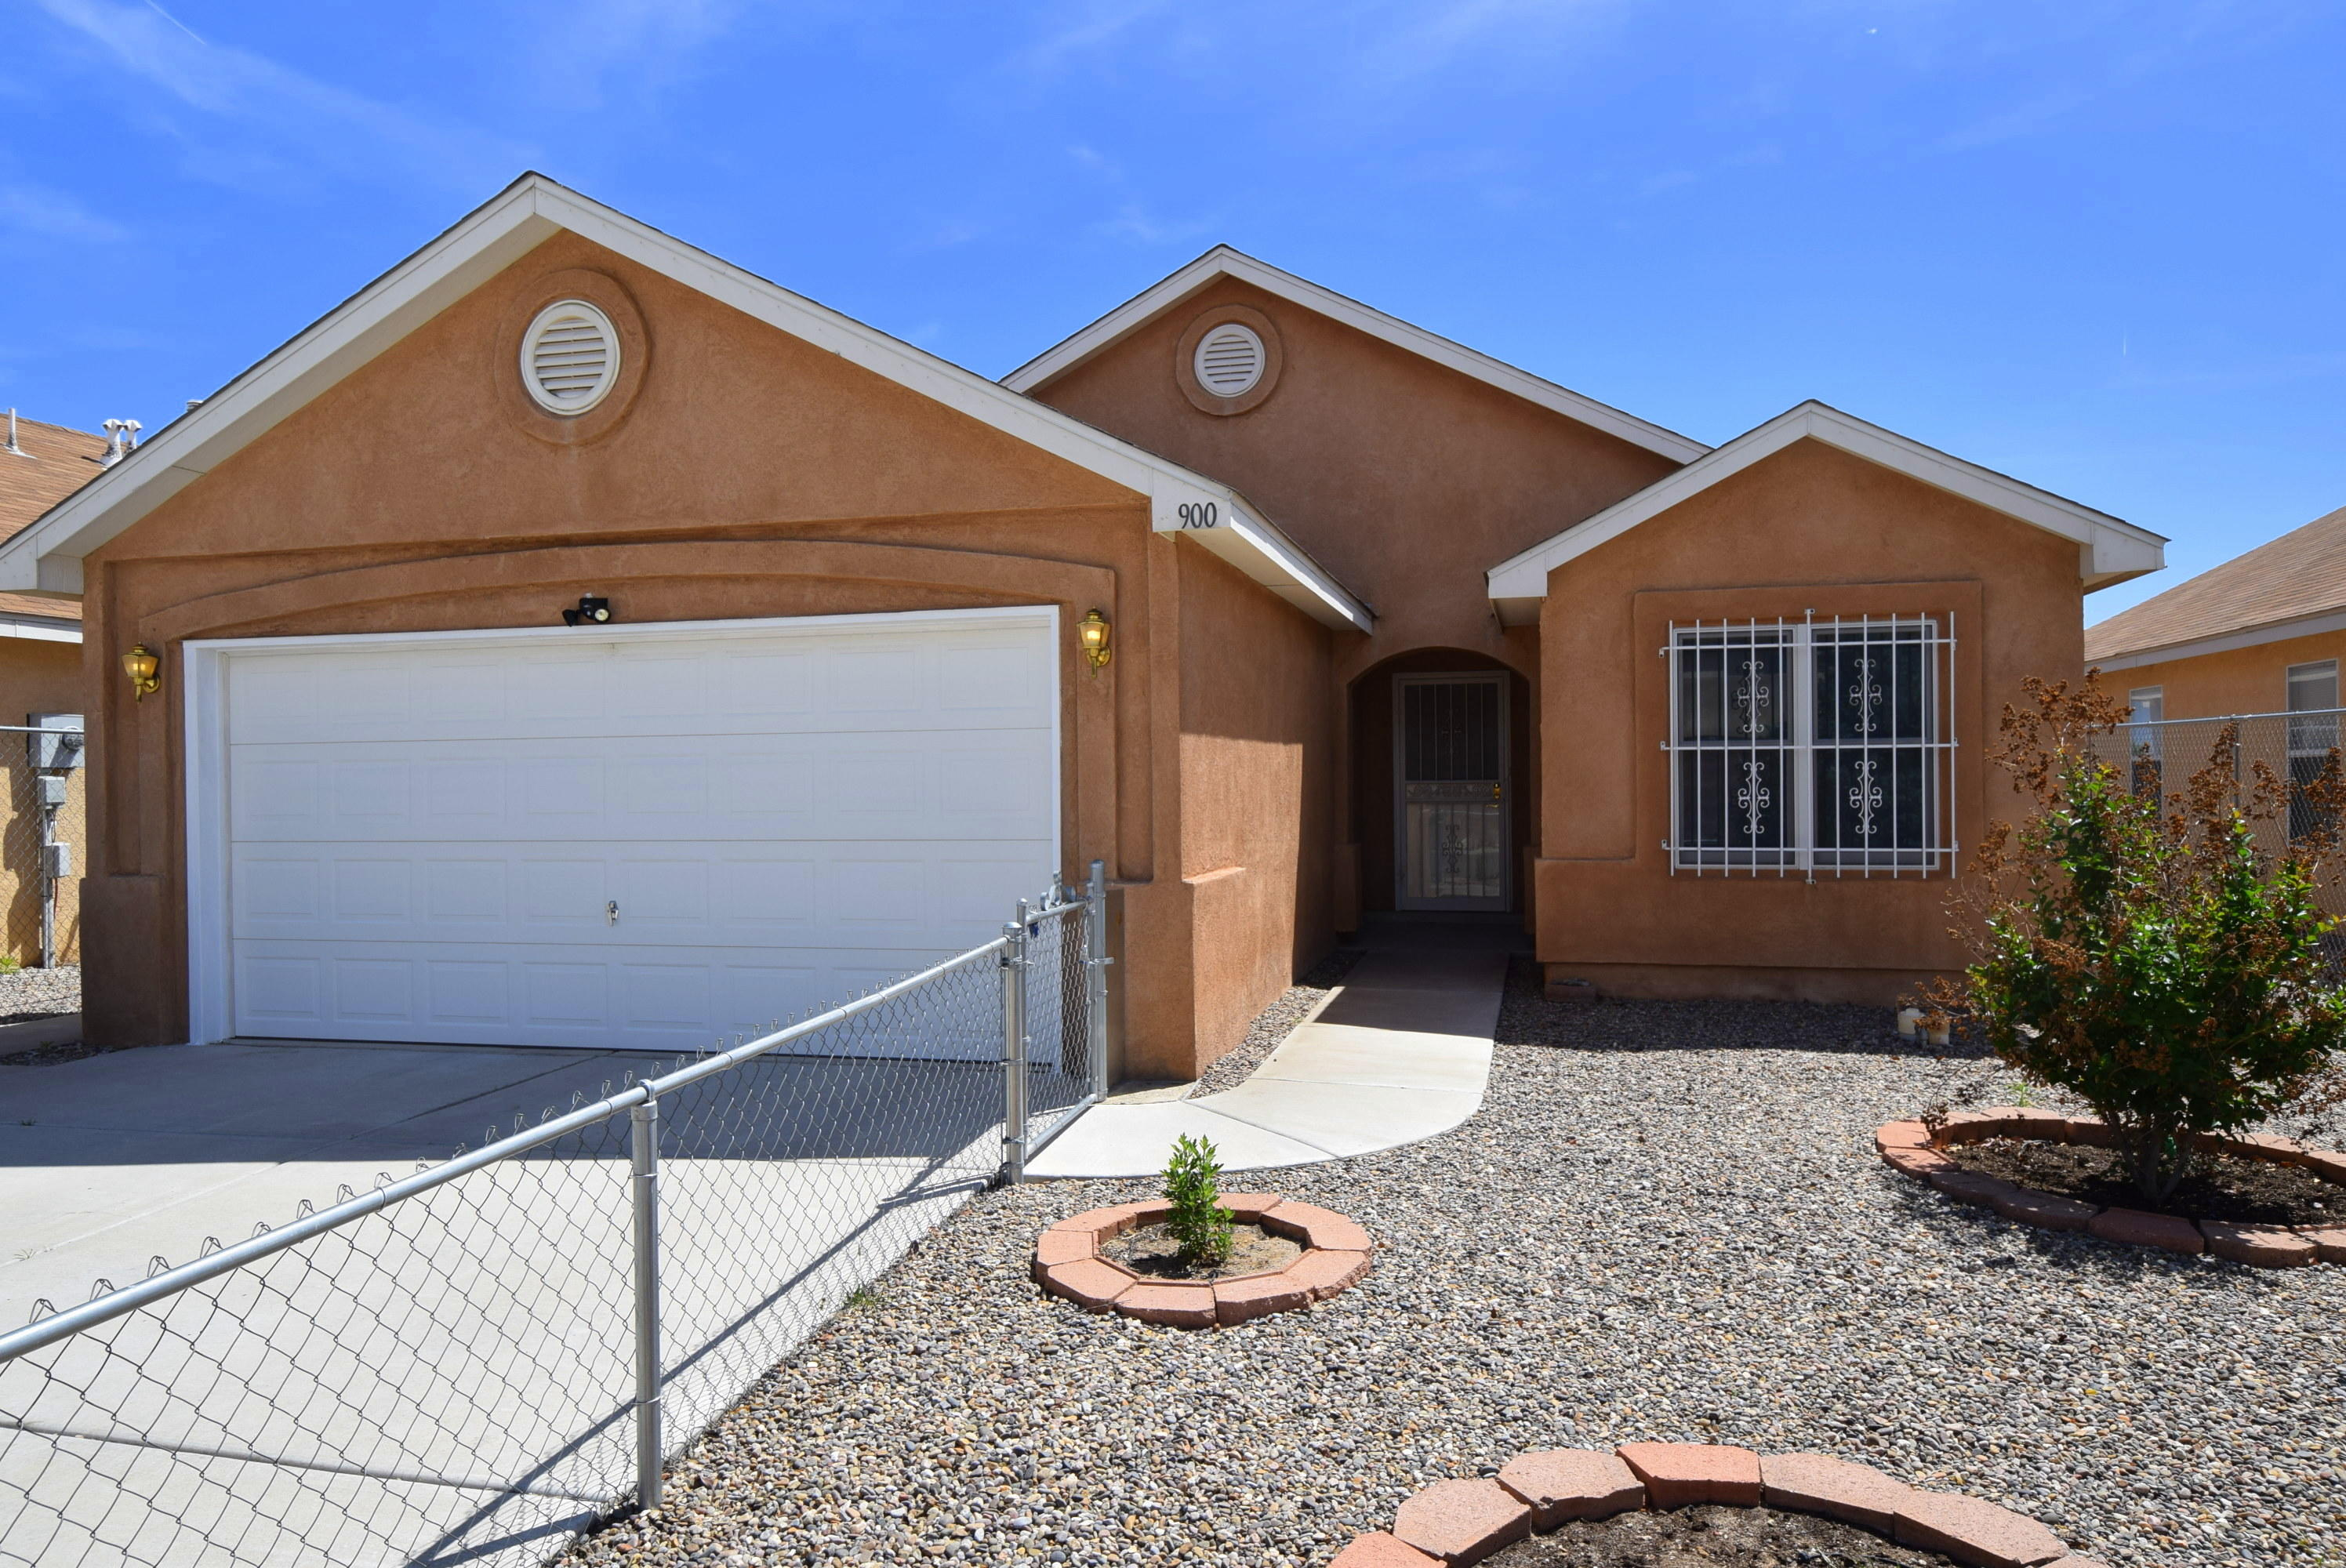 Photo of 900 Brackett Drive SW, Albuquerque, NM 87121